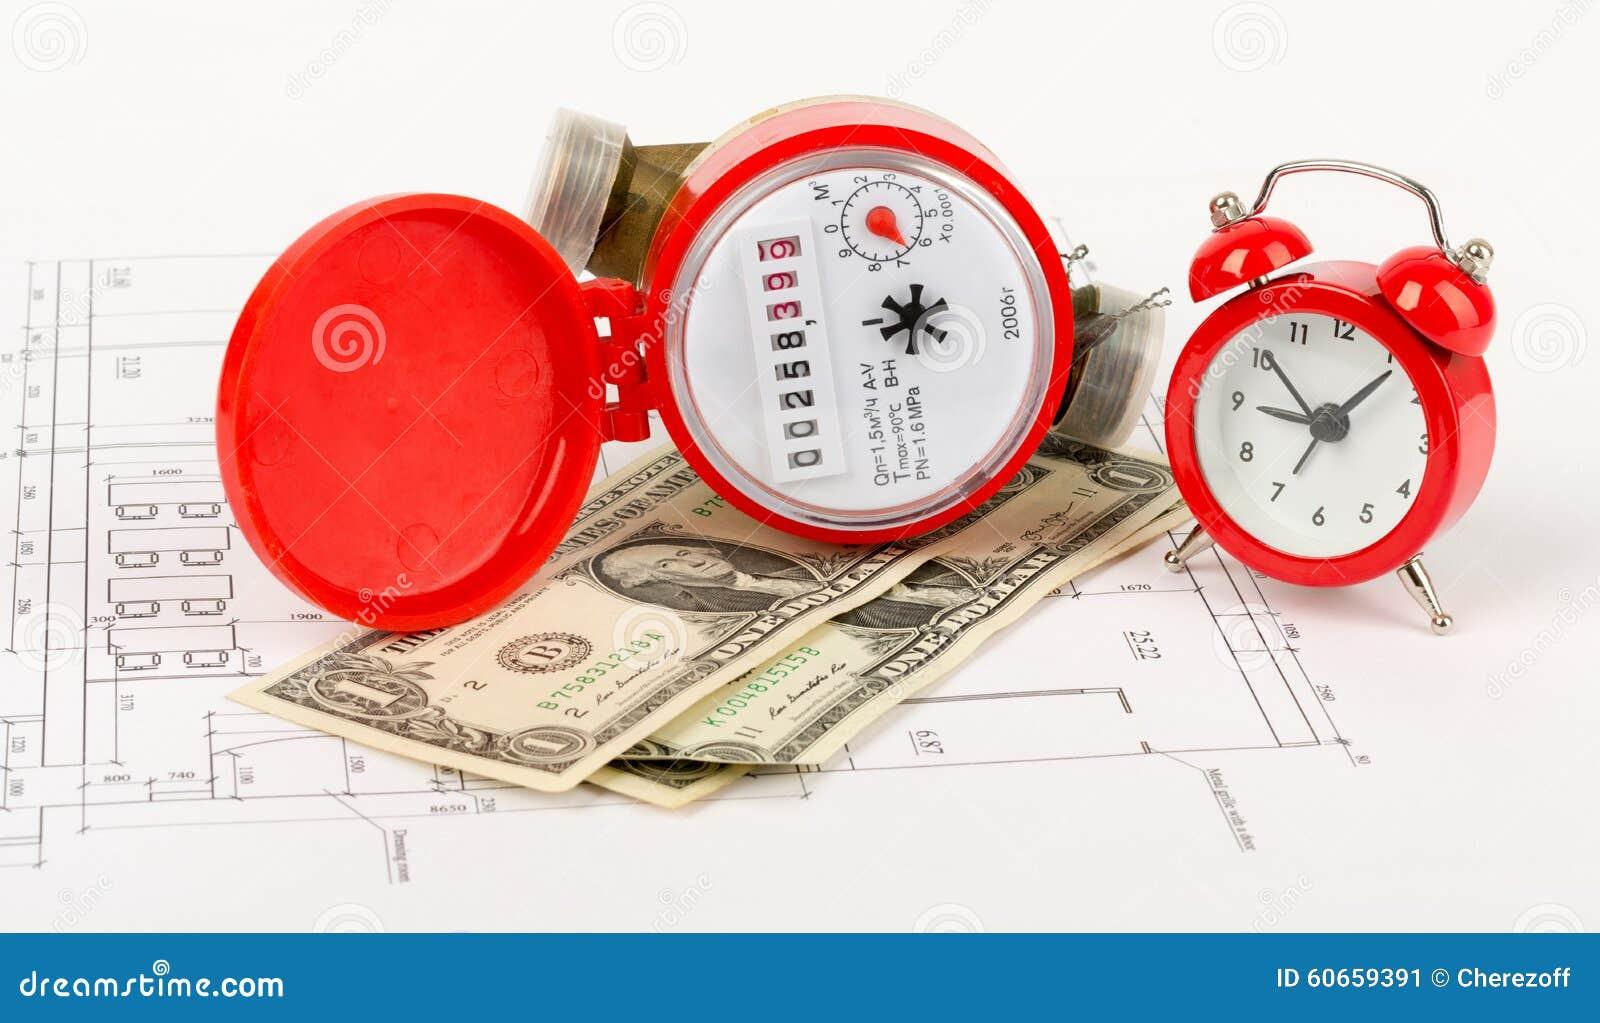 Power Meter Cartoon : Money meter royalty free cartoon cartoondealer